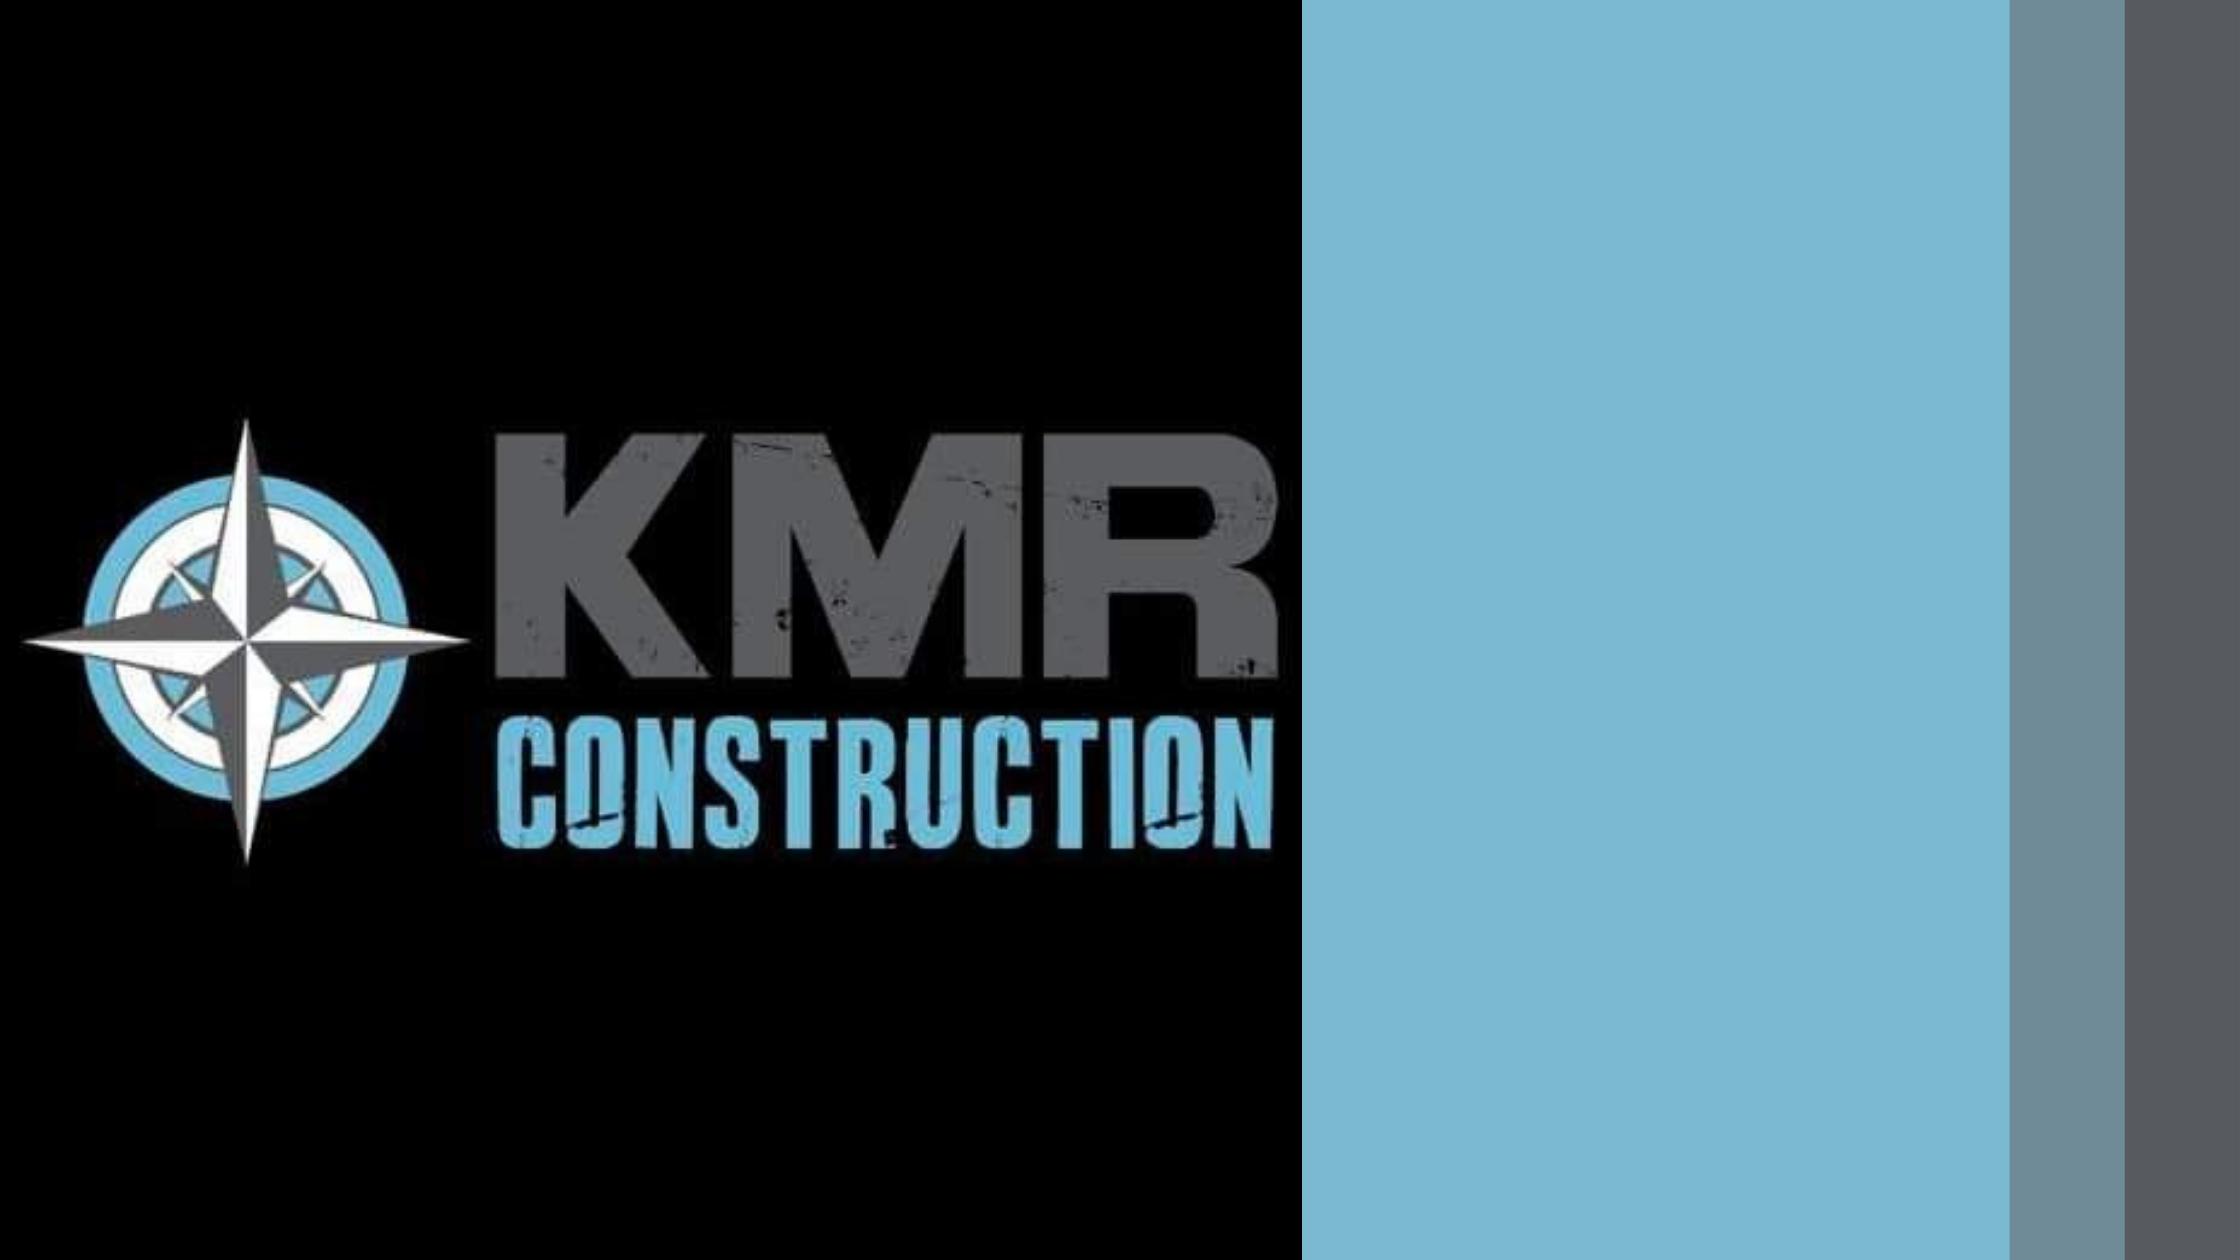 KMR Construction